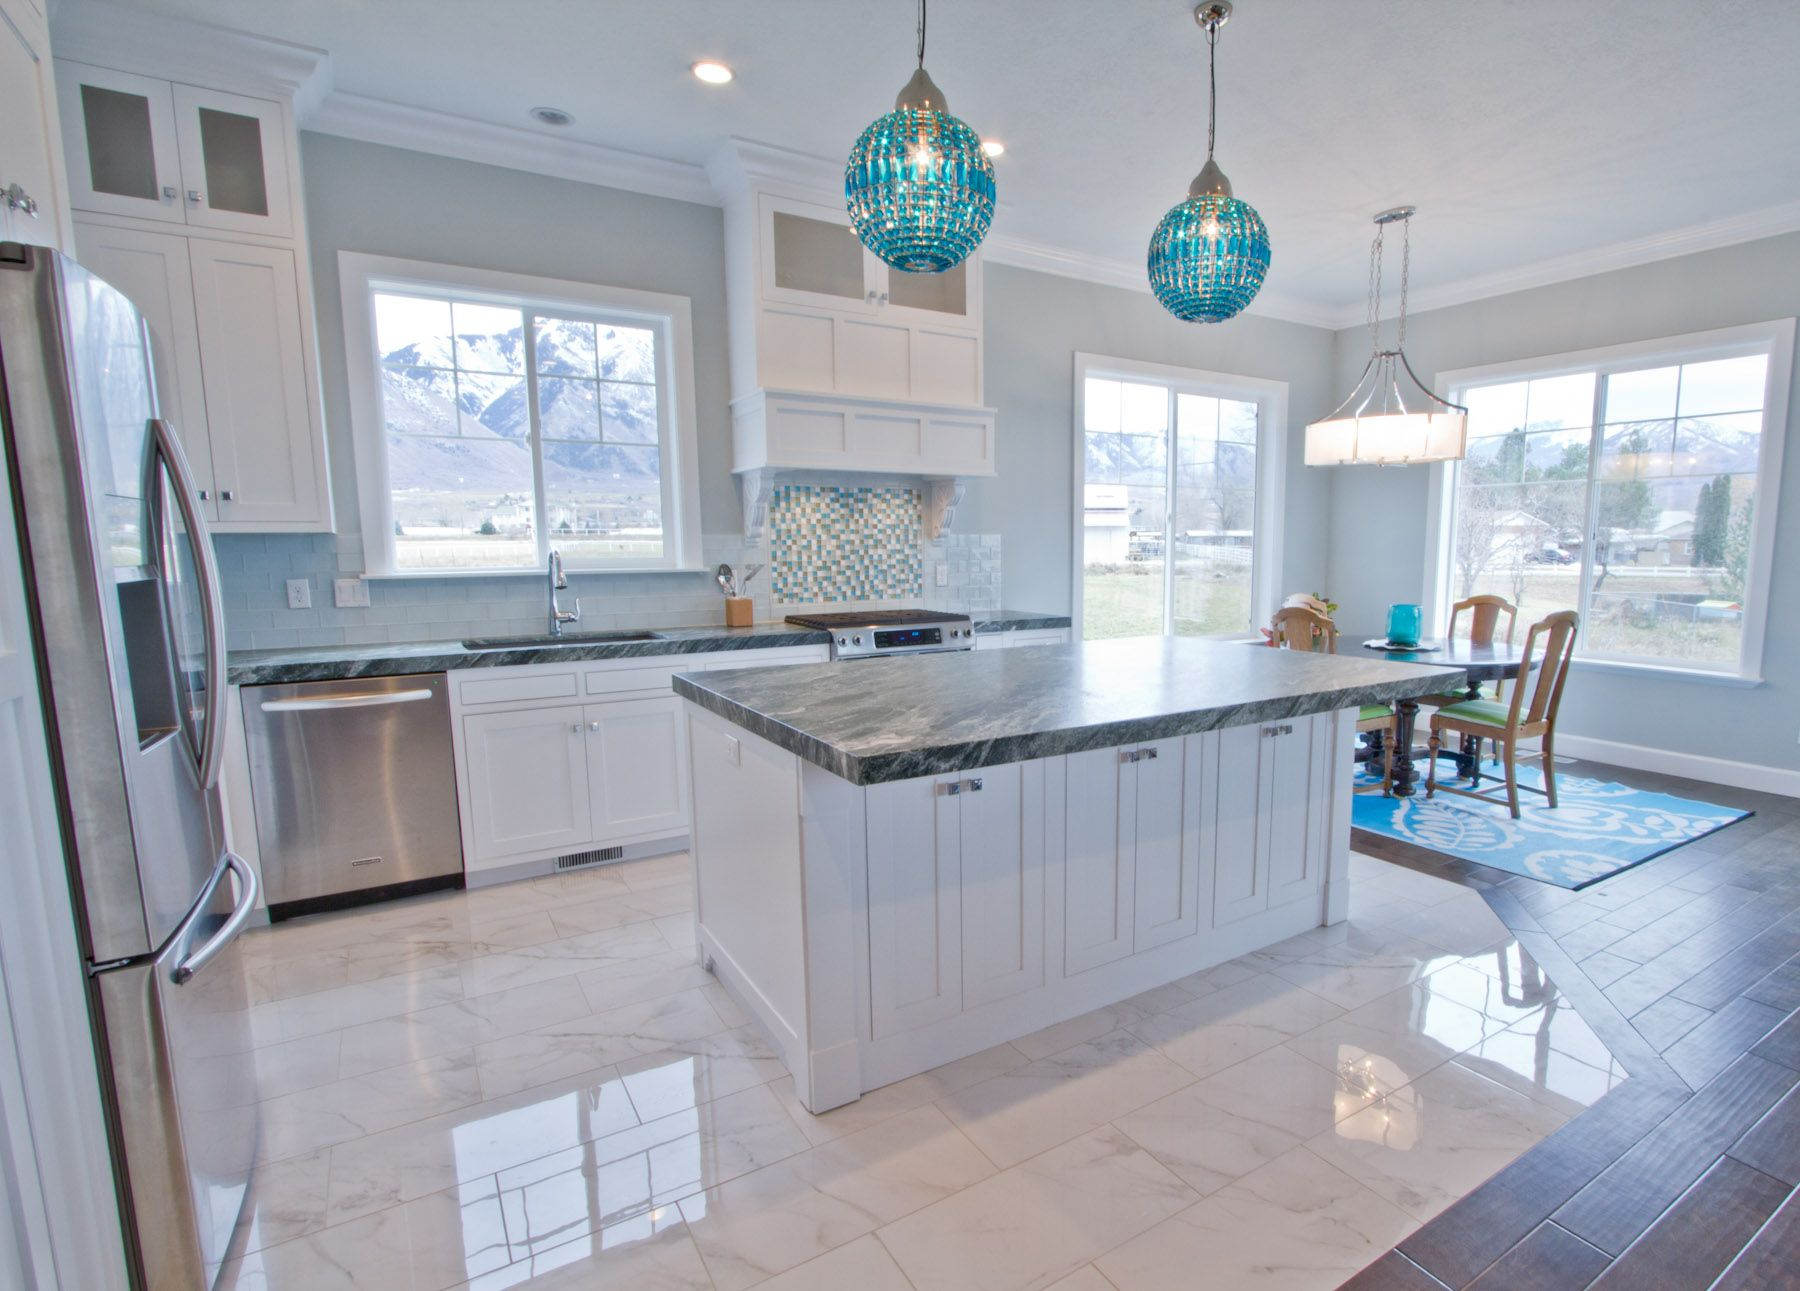 Coastal Kitchen Design Interior kitchen winning coastal kitchen ideas gray stained wall globe blue